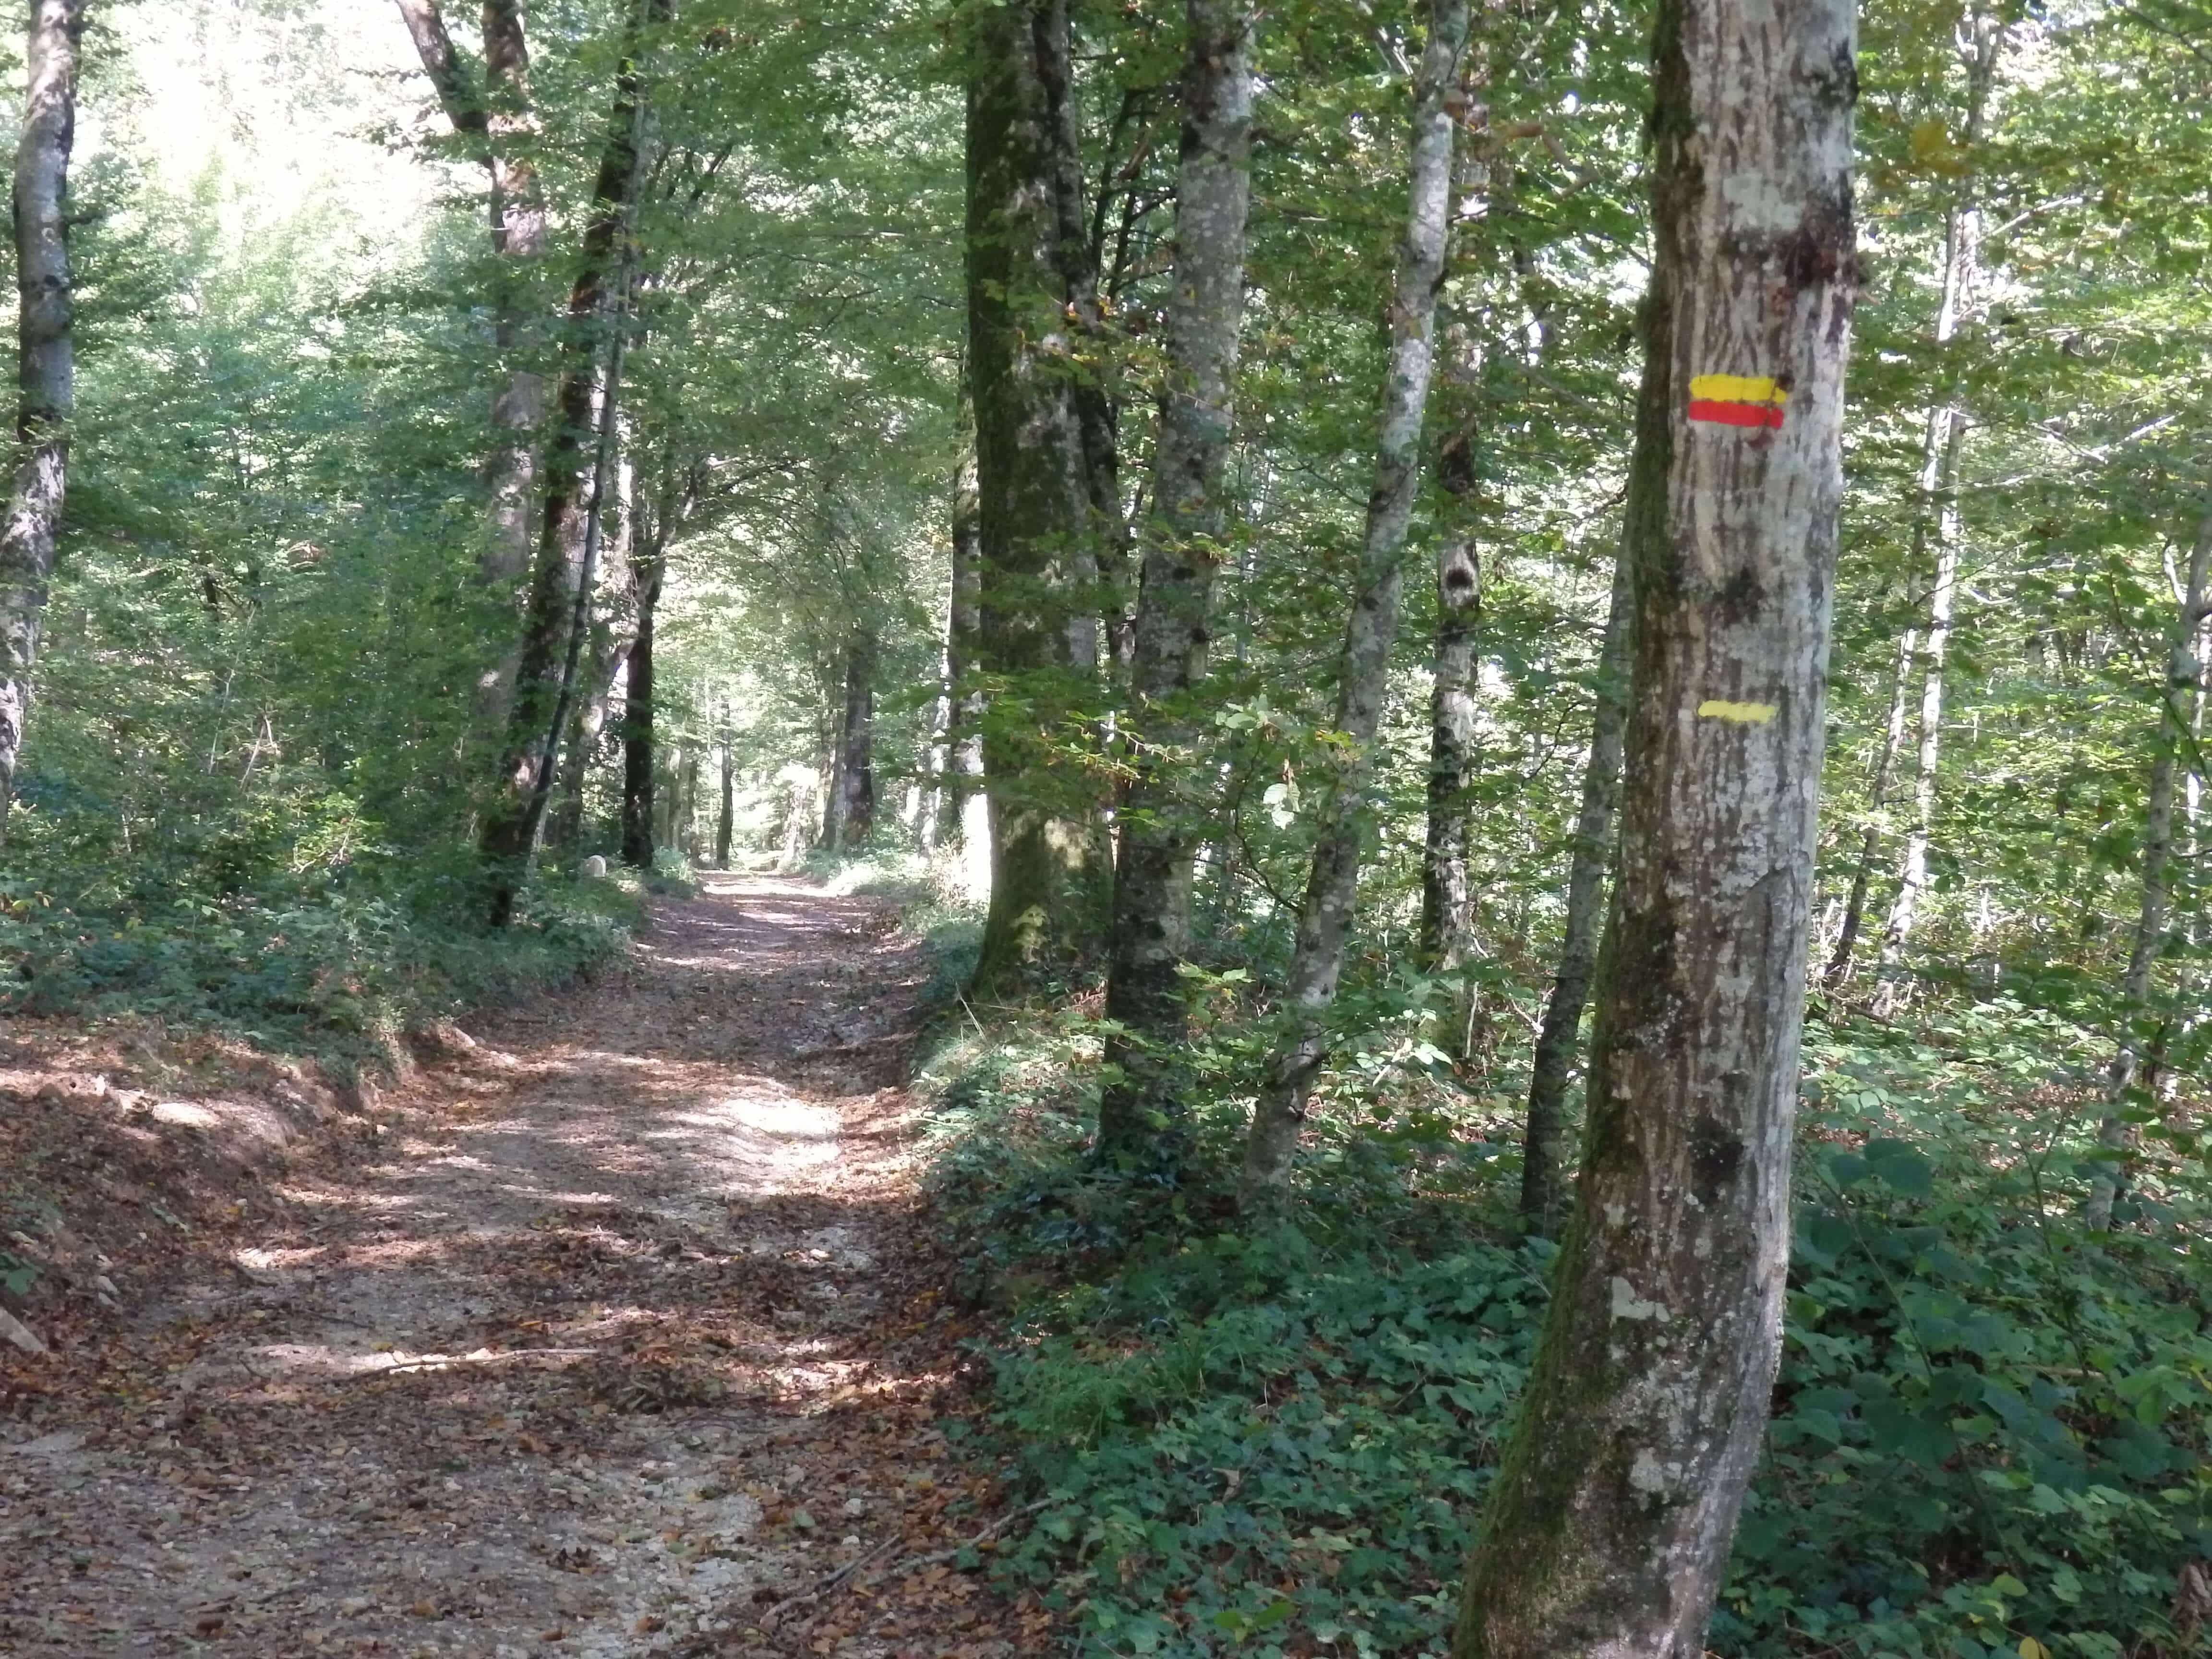 la forêt de Besançon